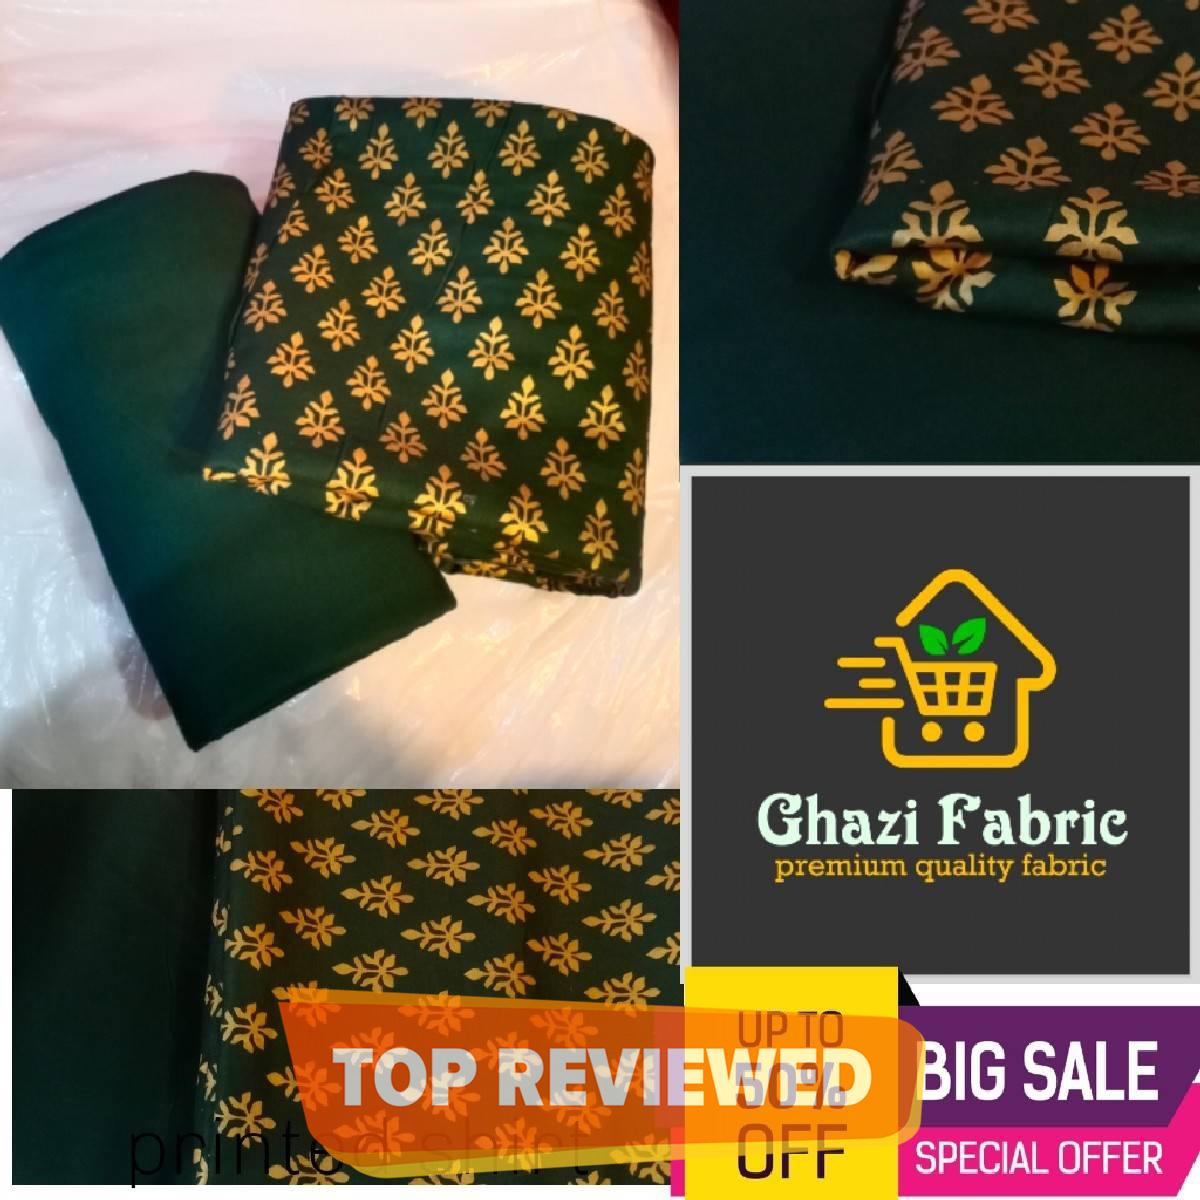 Ghazi fabric Unstitched Linen Printed shirt & Plain trouser 2 pc linen collection green (982)